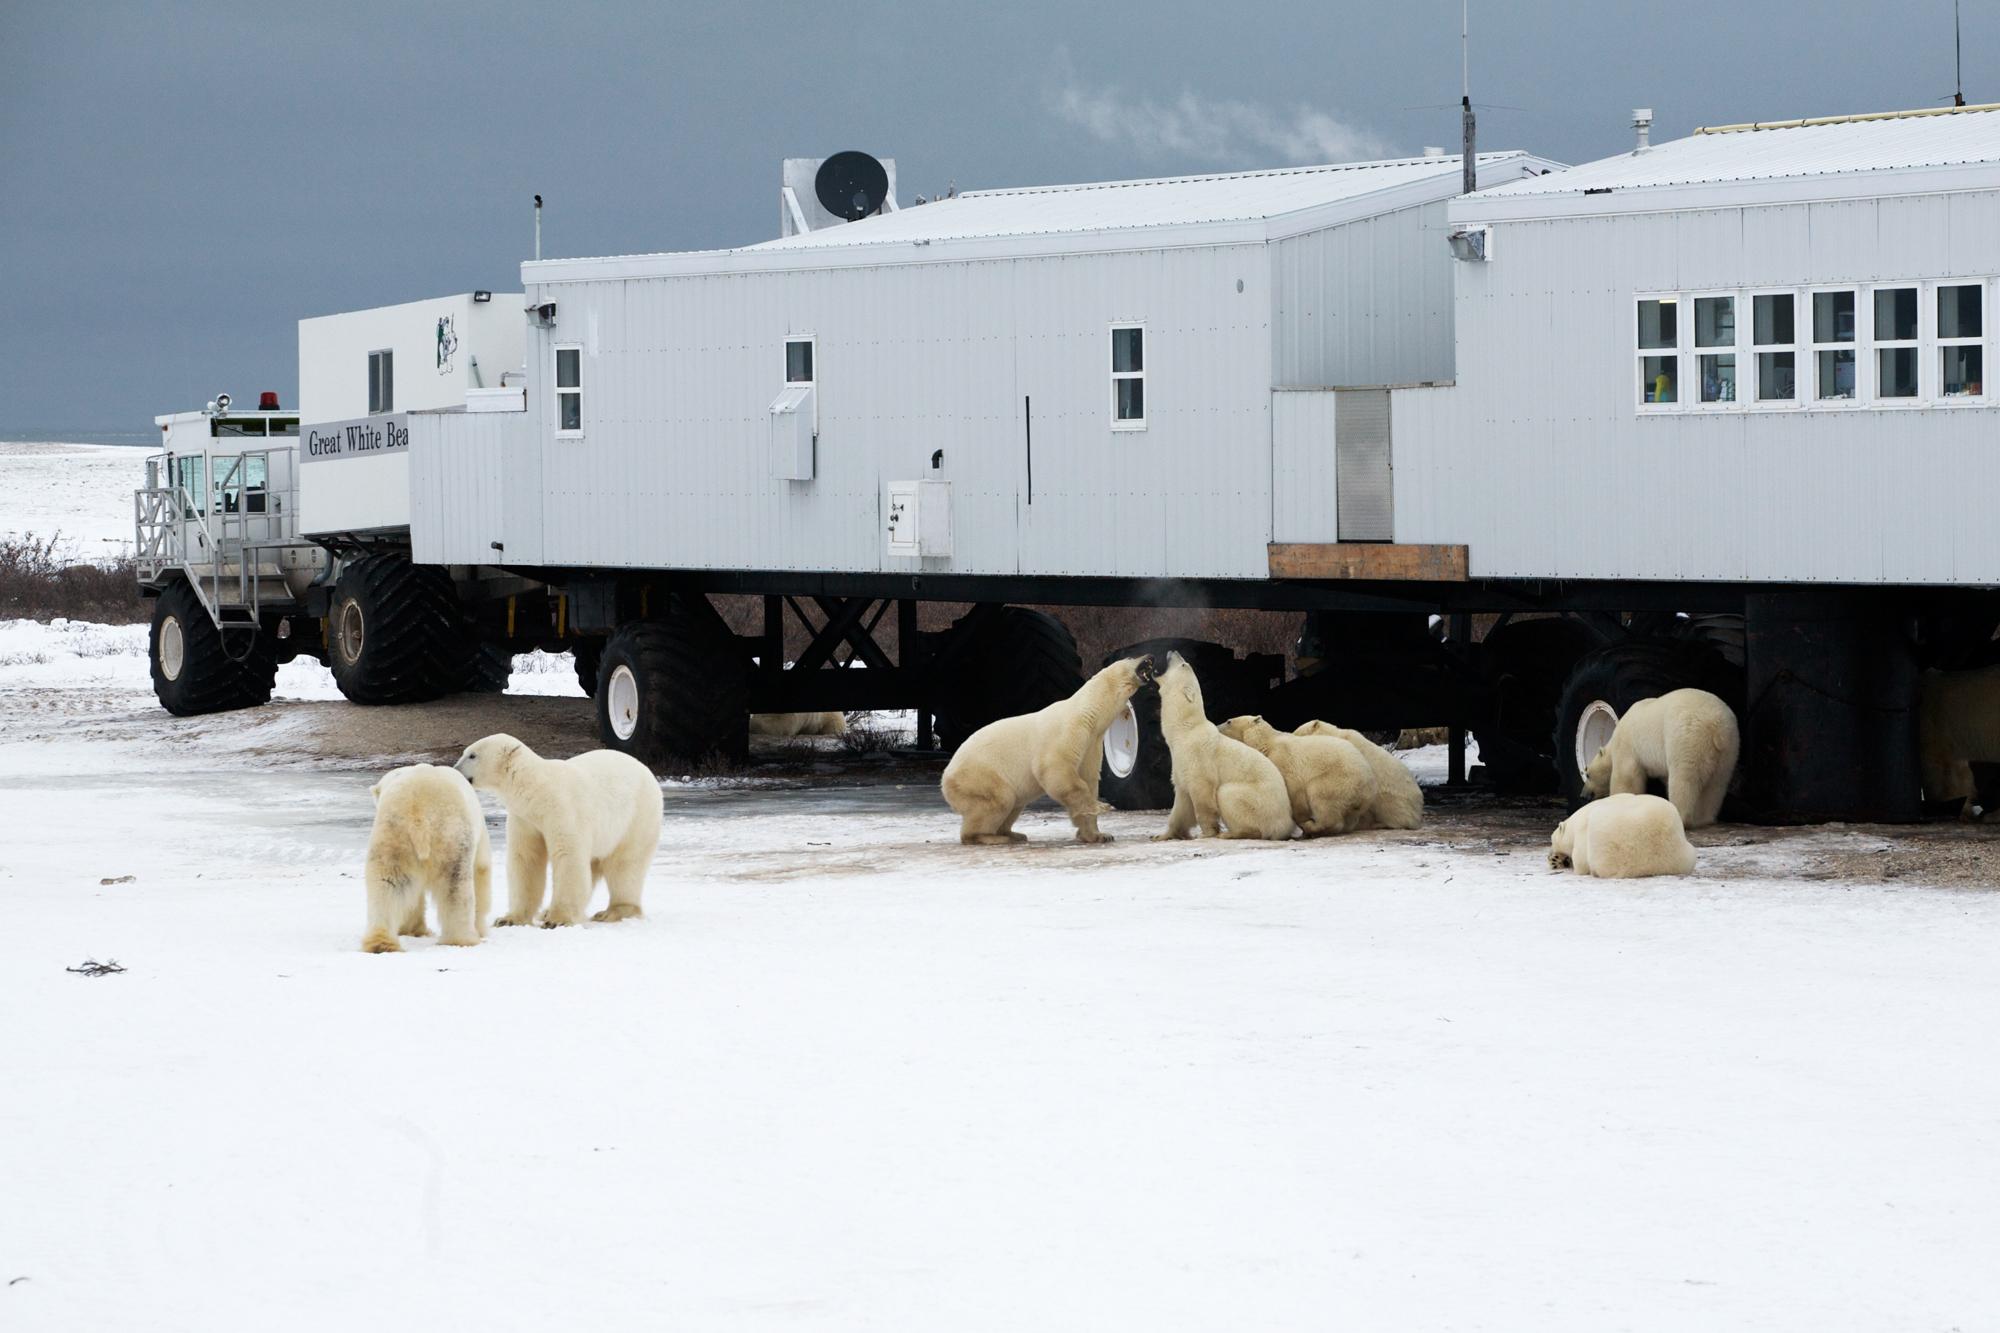 Tundra Lodge with Polar Bears playing